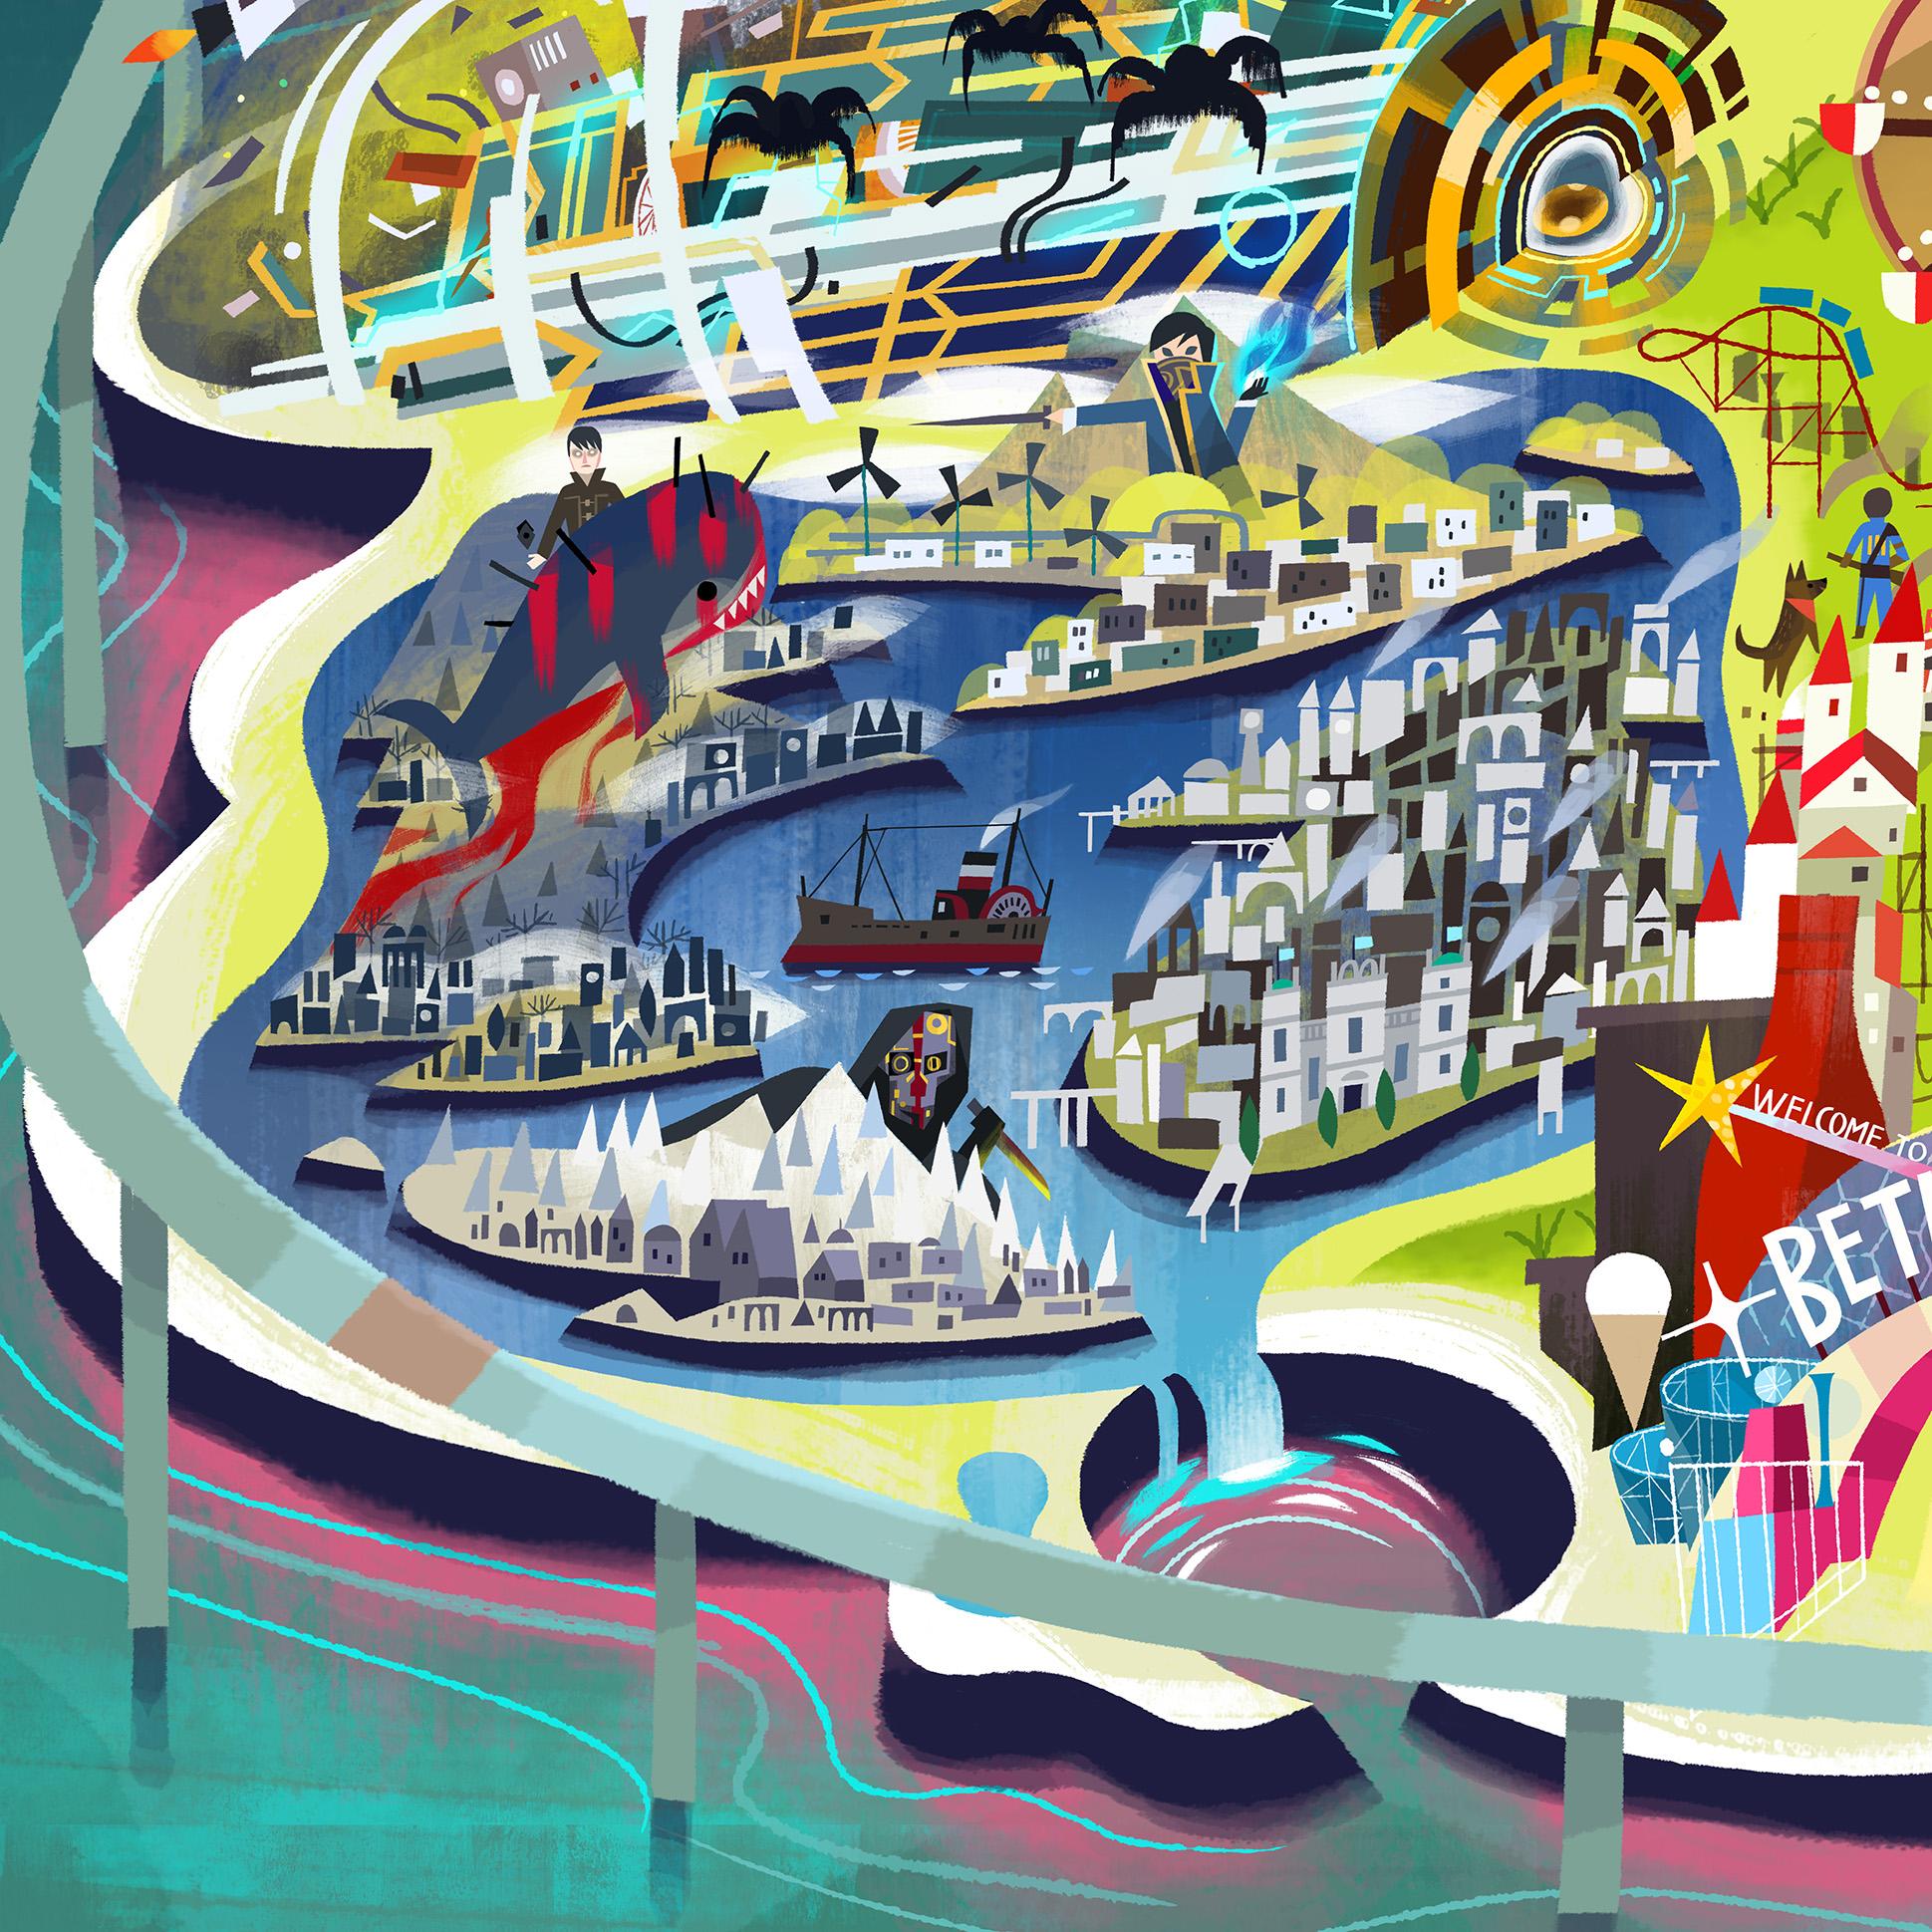 B3thesdaland_map_color1_closeup2.jpg